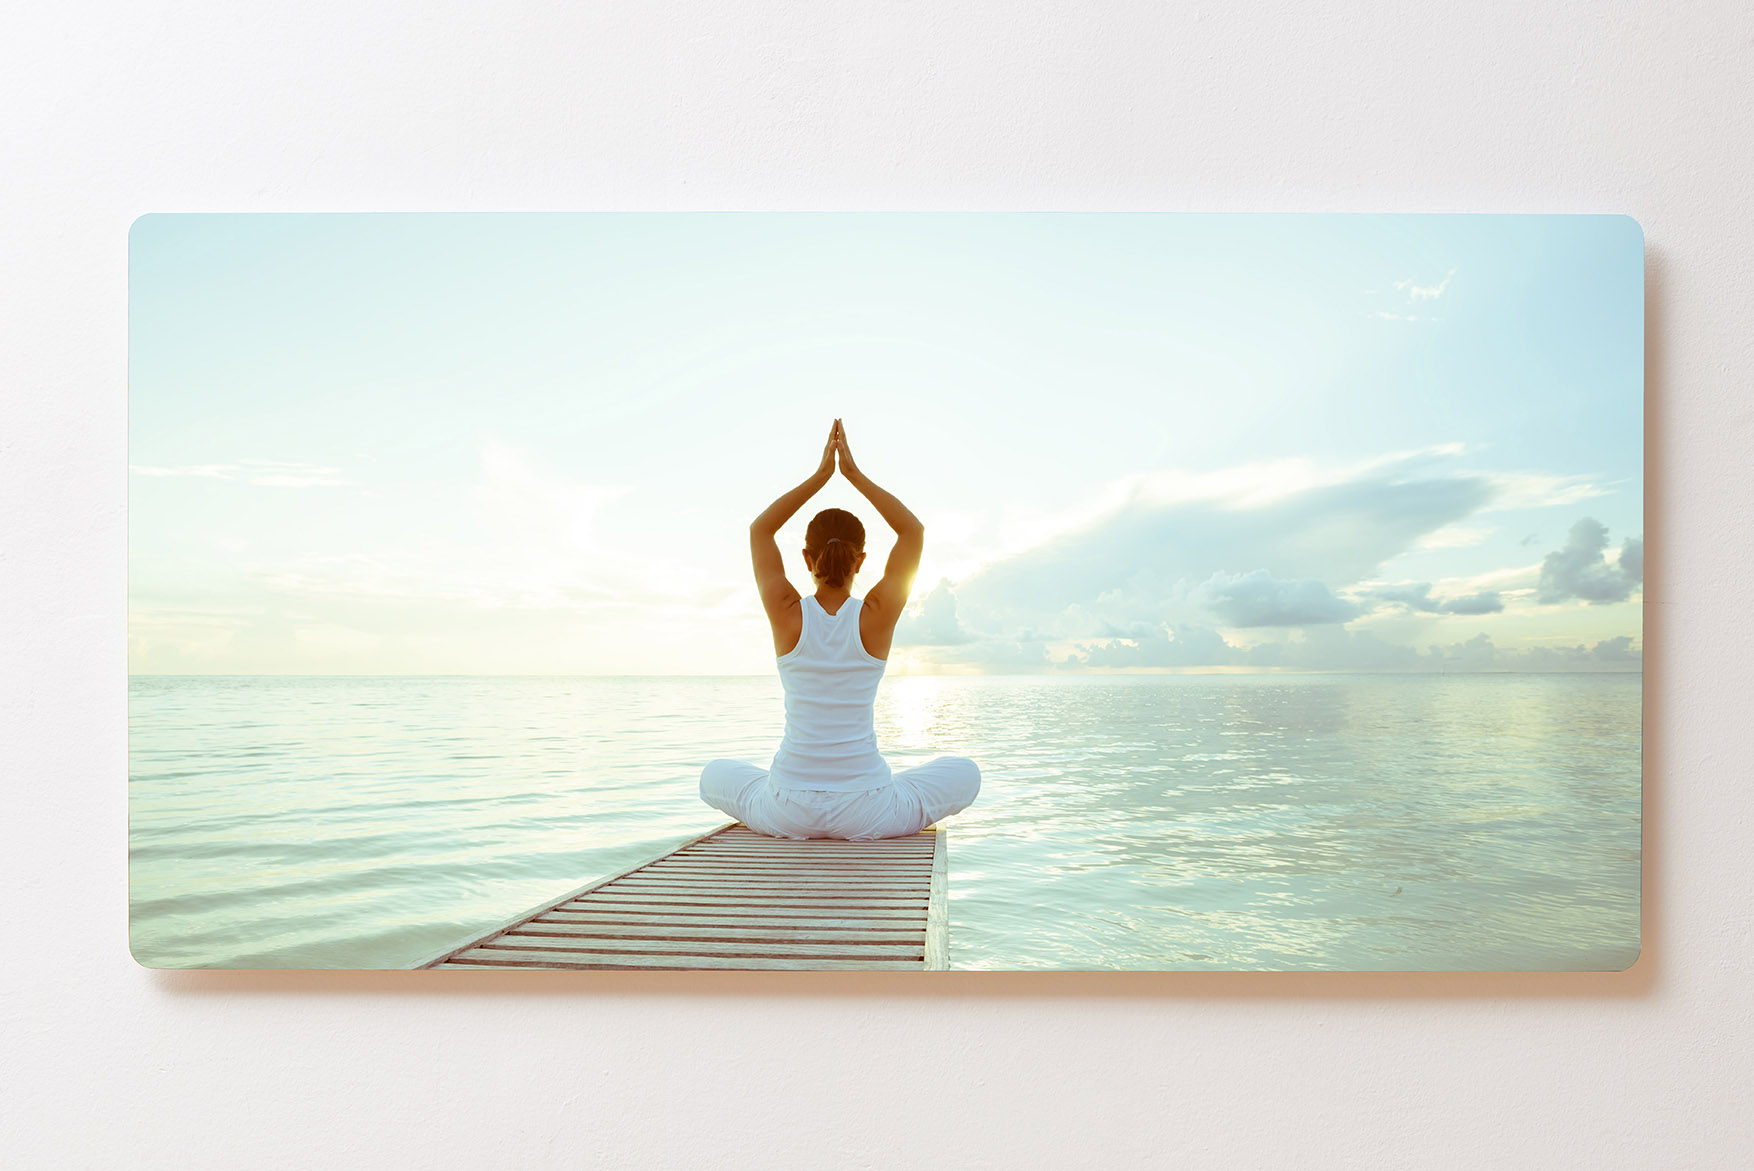 Magnettafel BACKLIGHT 120x60cm Motiv-Wandbild M104 Yoga Sonnenaufgang